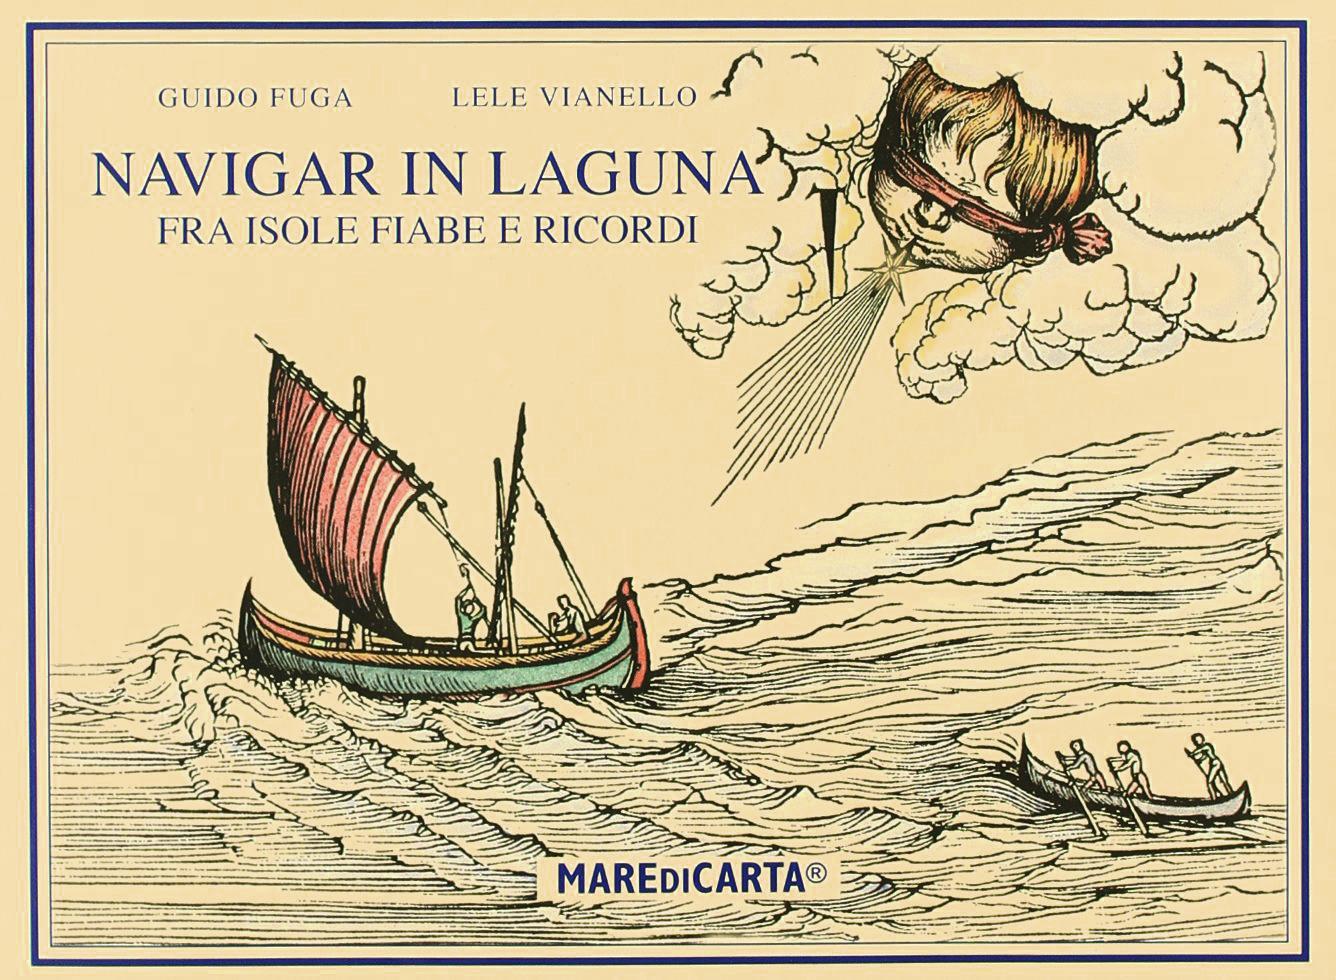 Navigar in Laguna, copertina